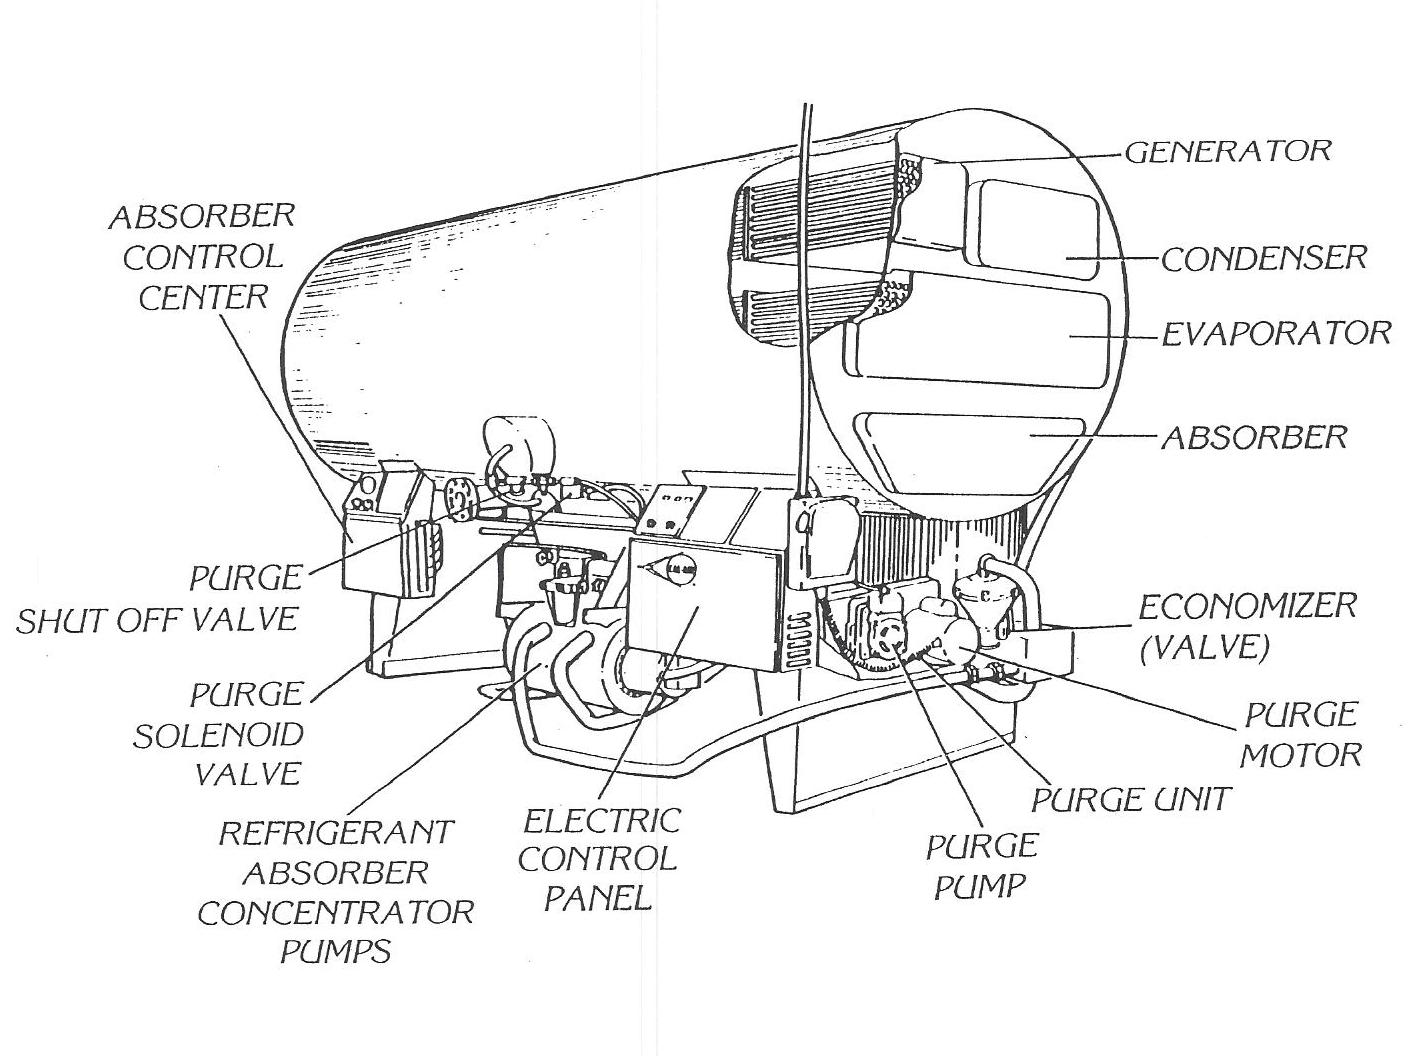 Trane Chiller Control Wiring Diagram